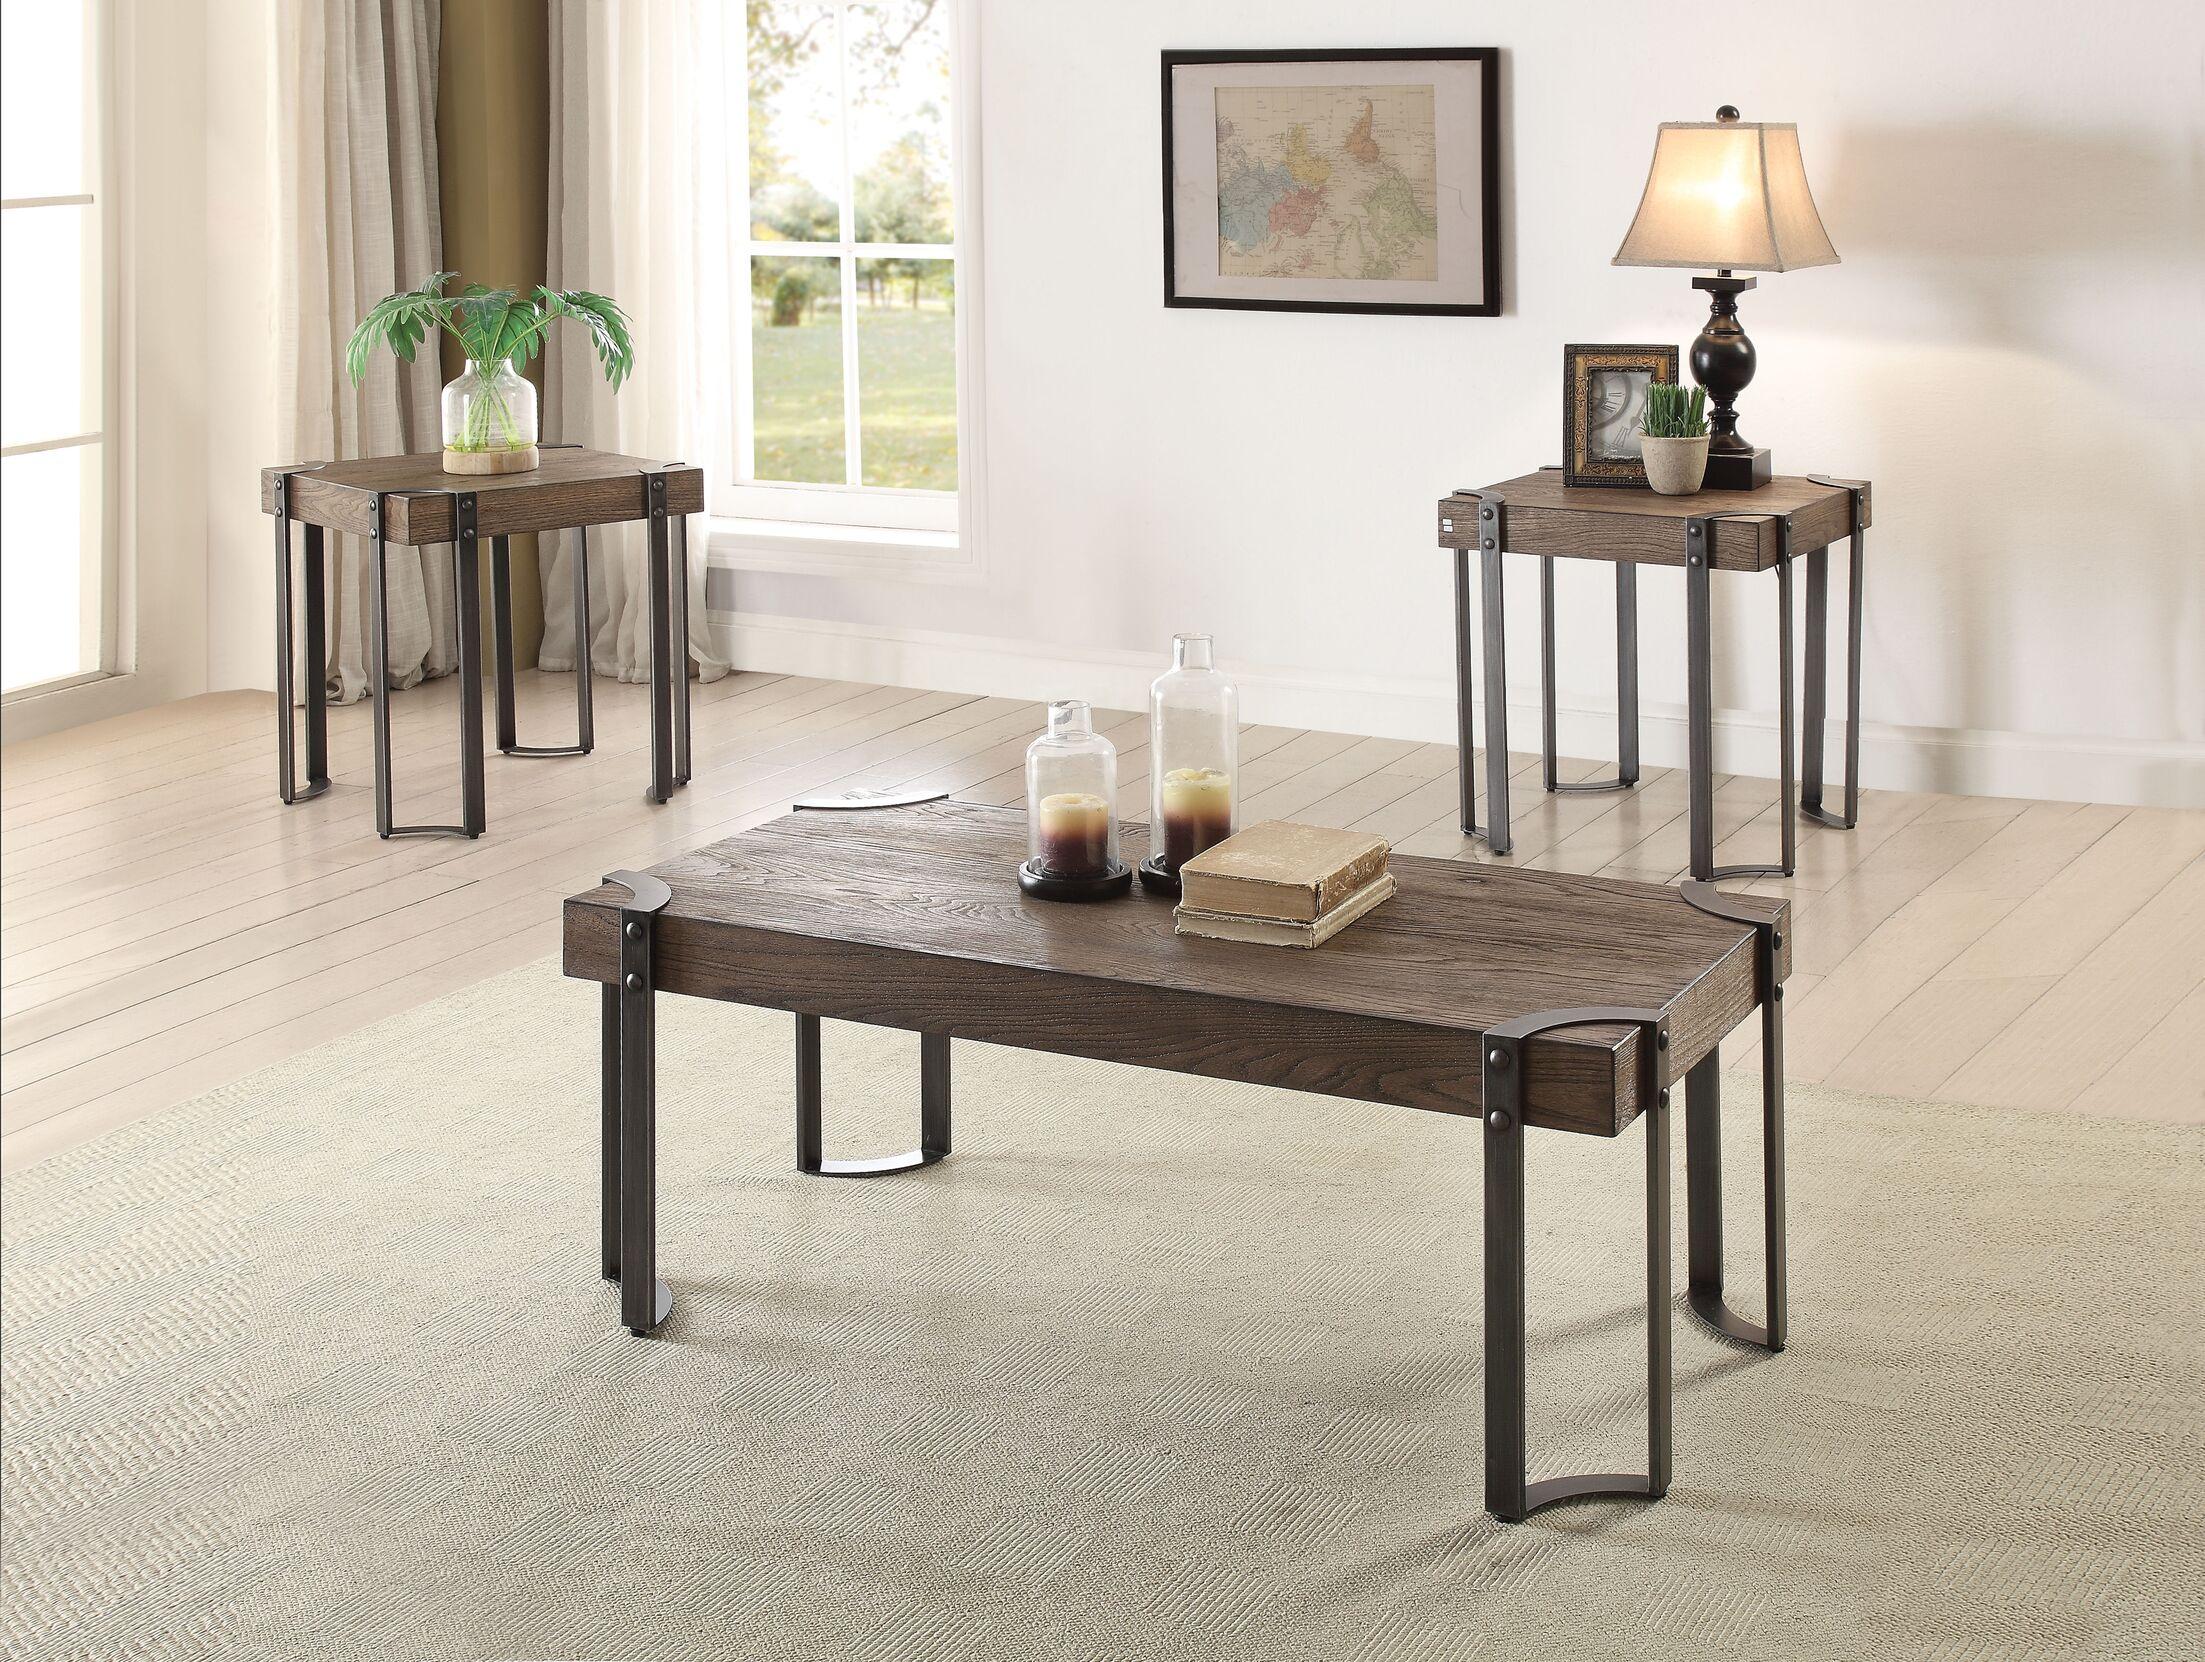 Cristobal 3 Piece Coffee Table Set